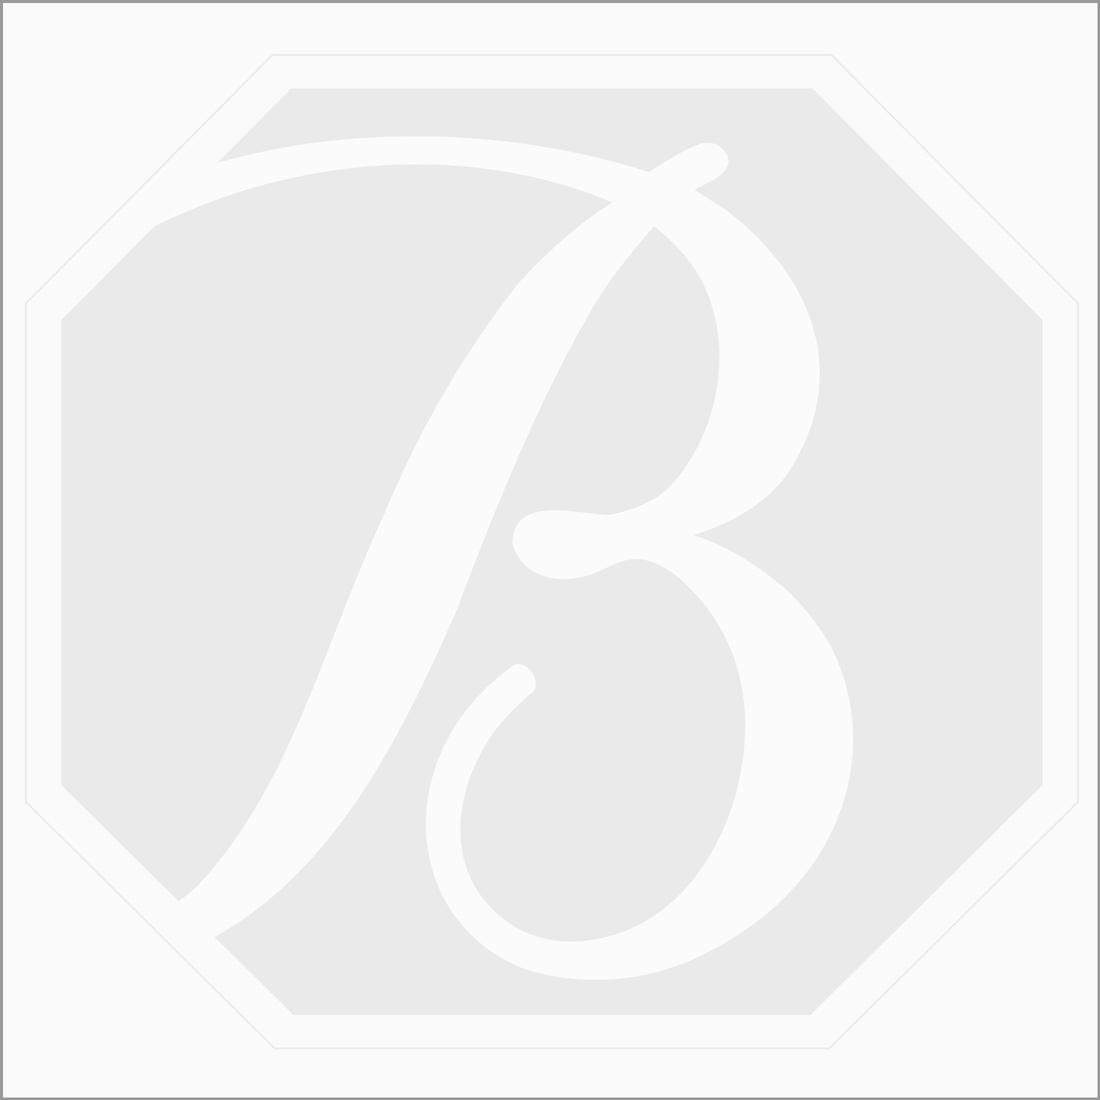 9 Pieces - Medium Tones Multi-Sapphire Rose Cut - 12.50 x 9.50 mm to 14 x 10.50 mm - 62.16 carats (MSRC1317)